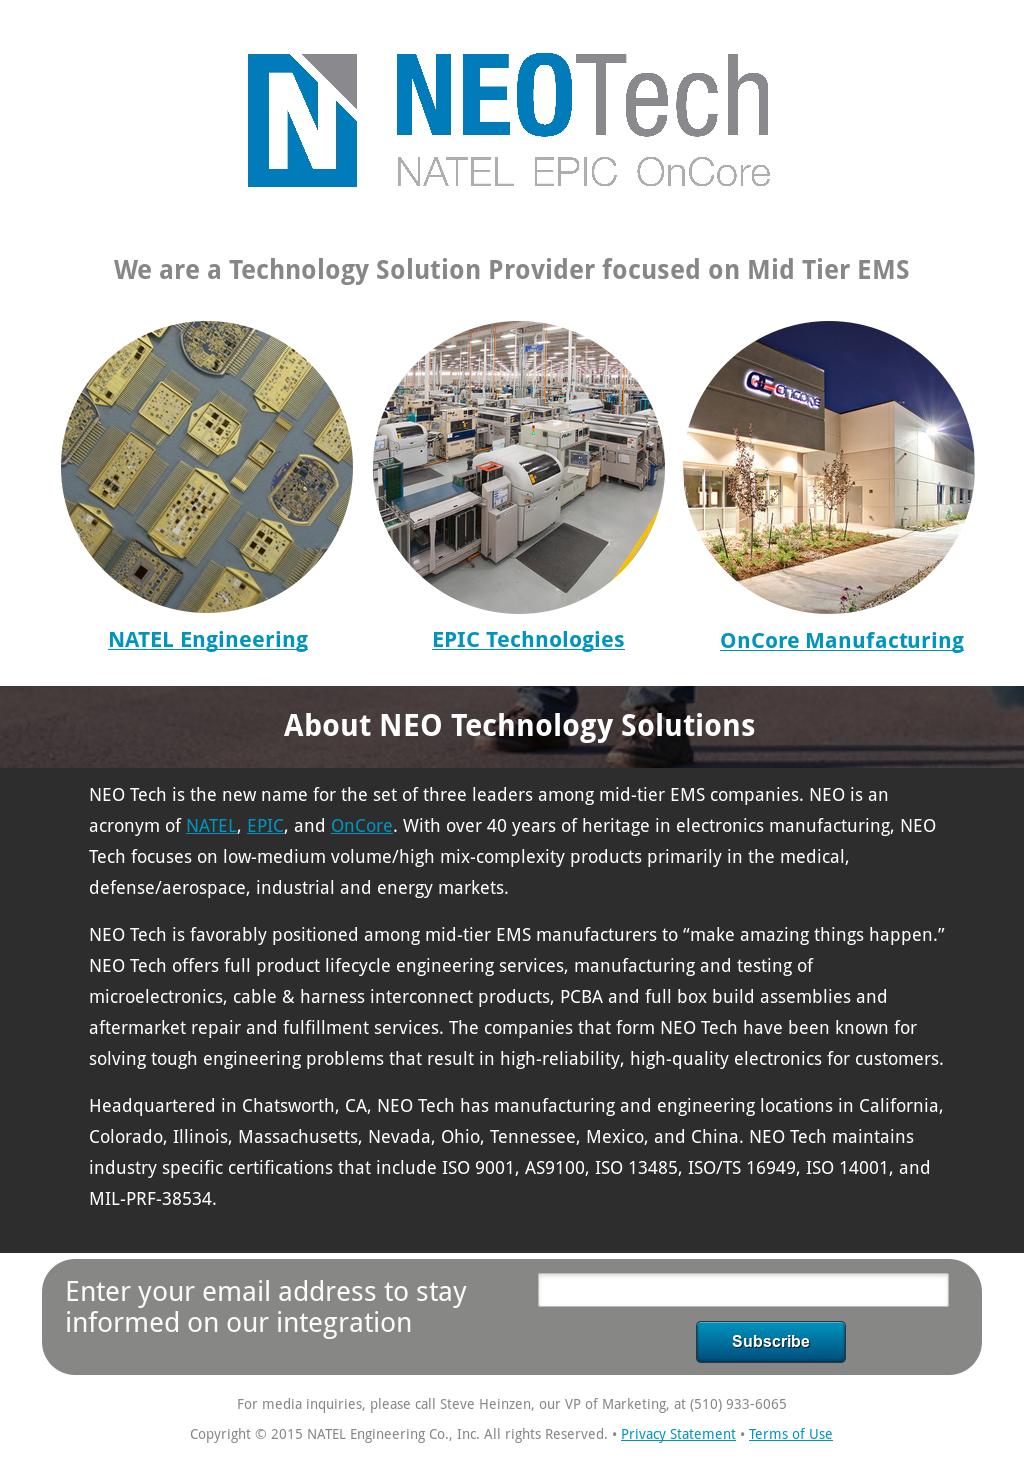 Neo Tech Competitors, Revenue and Employees - Owler Company Profile